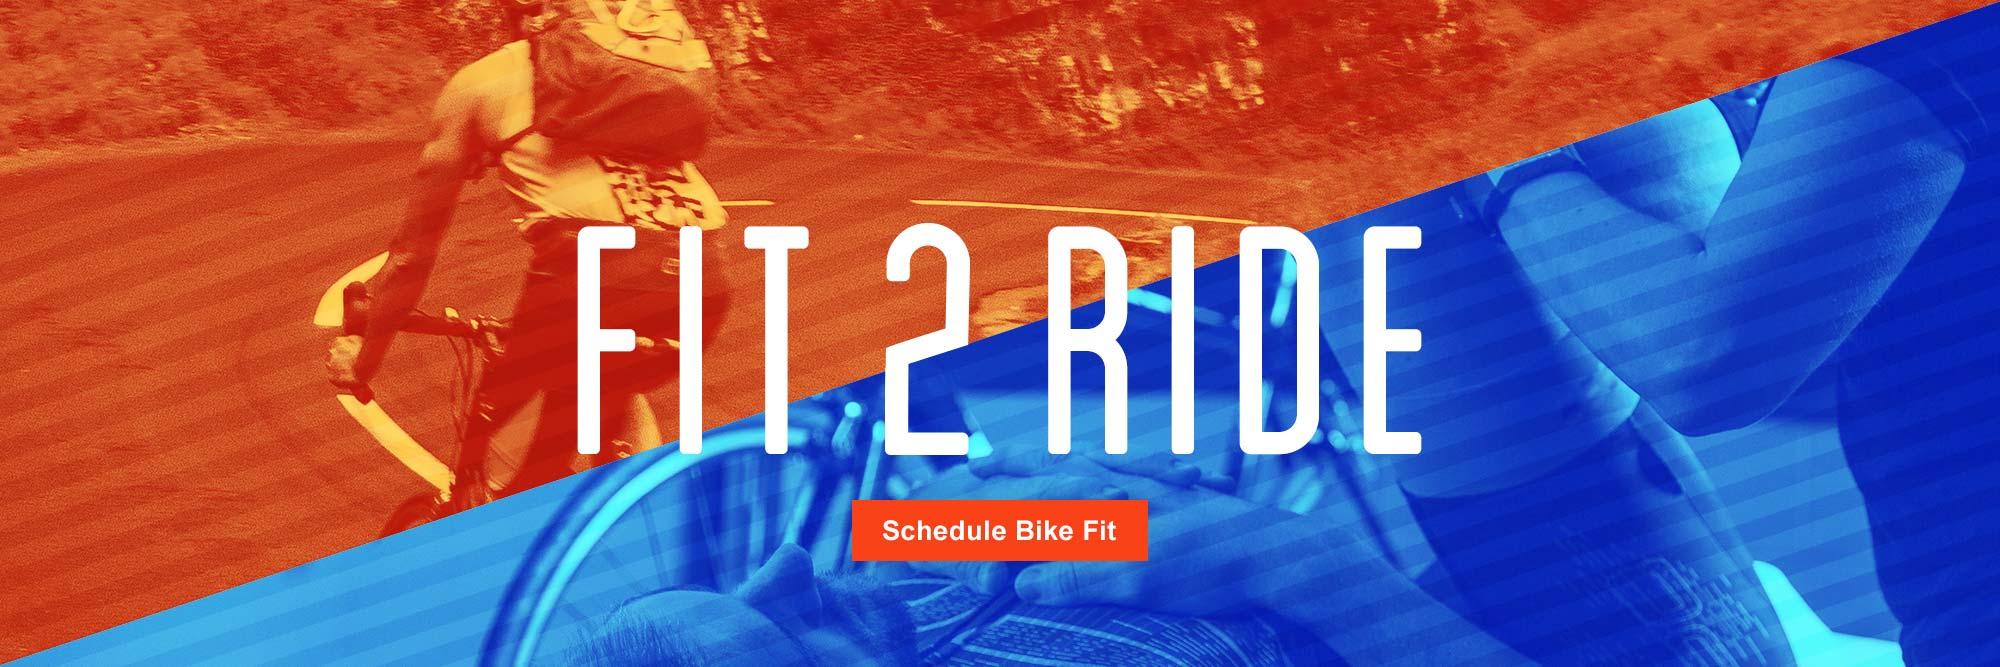 Bike Fitting at Handlebar Cyclery